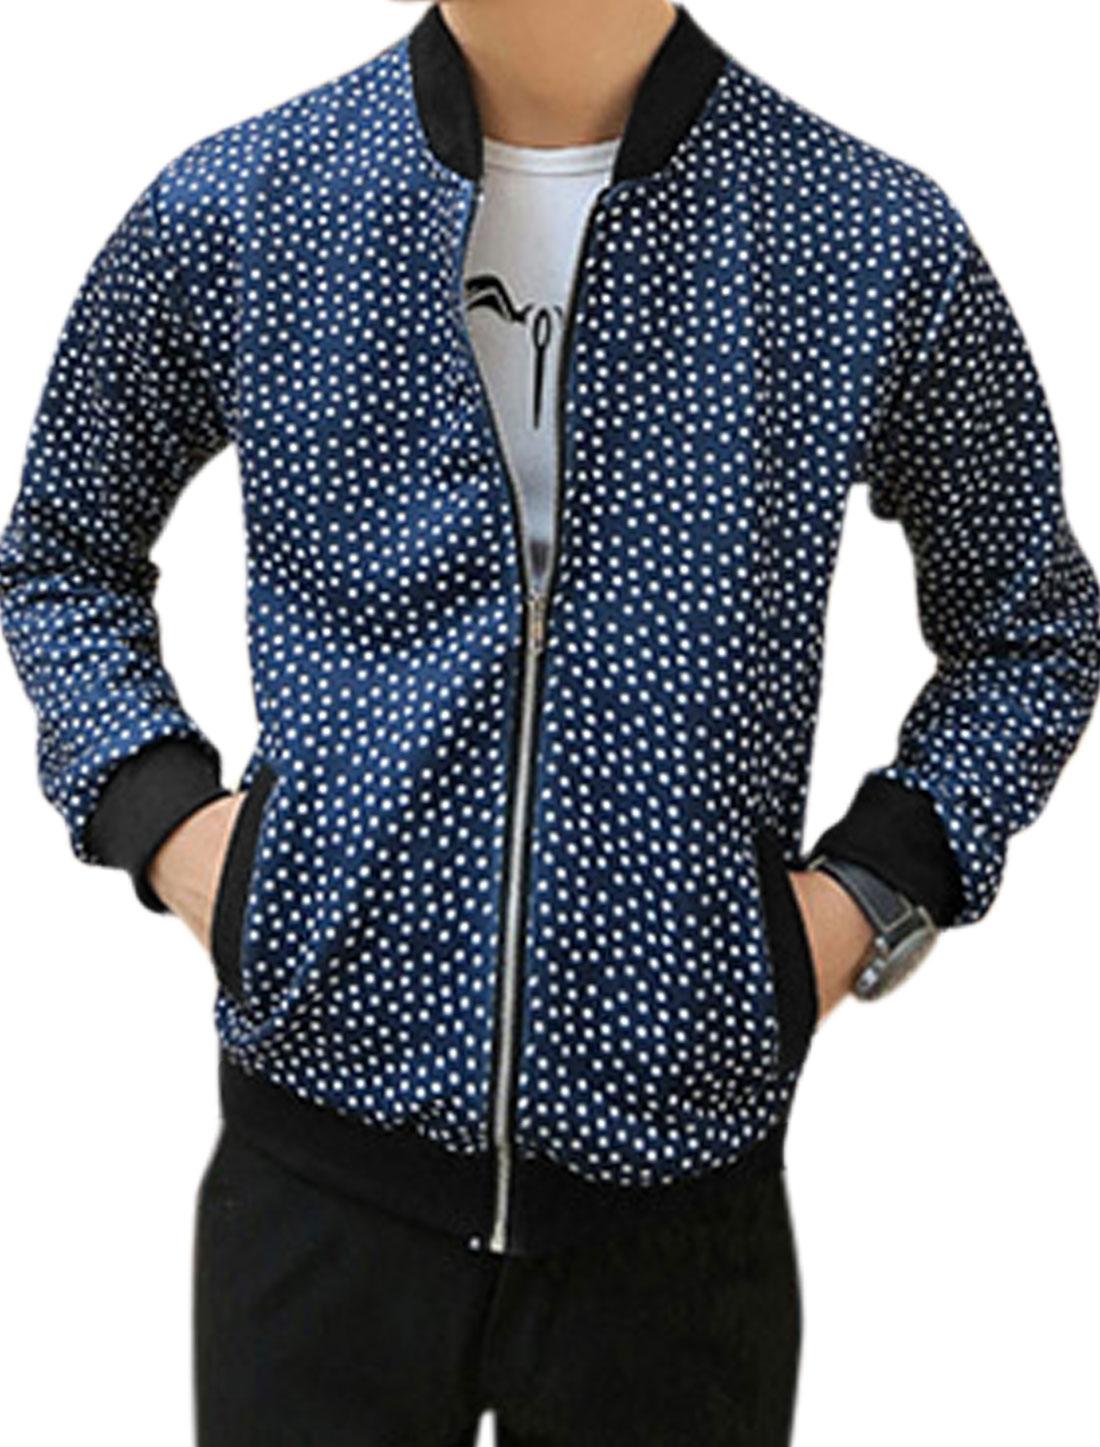 Men Ribbed Trim Dots Zip Closure Fashion Basic Jacket Navy Blue M